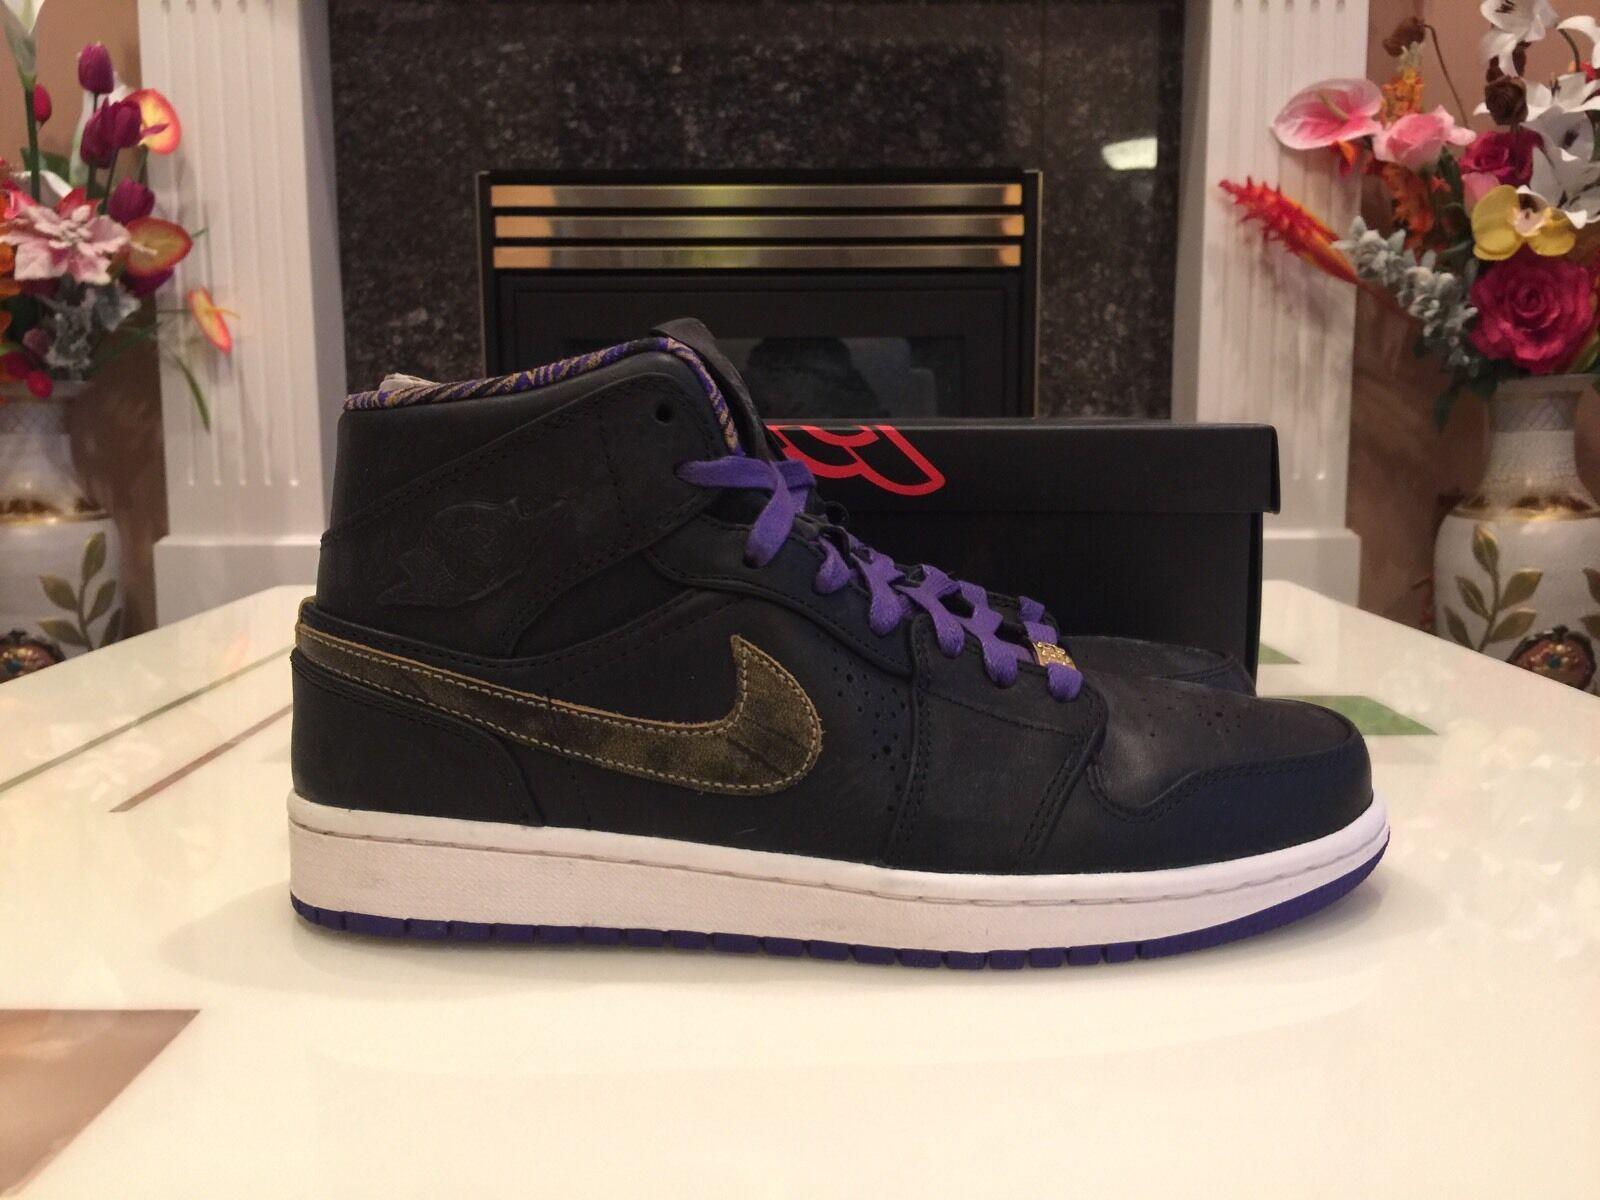 Nike Air Jordan 1 Mid Nouveau BHM Comfortable The latest discount shoes for men and women